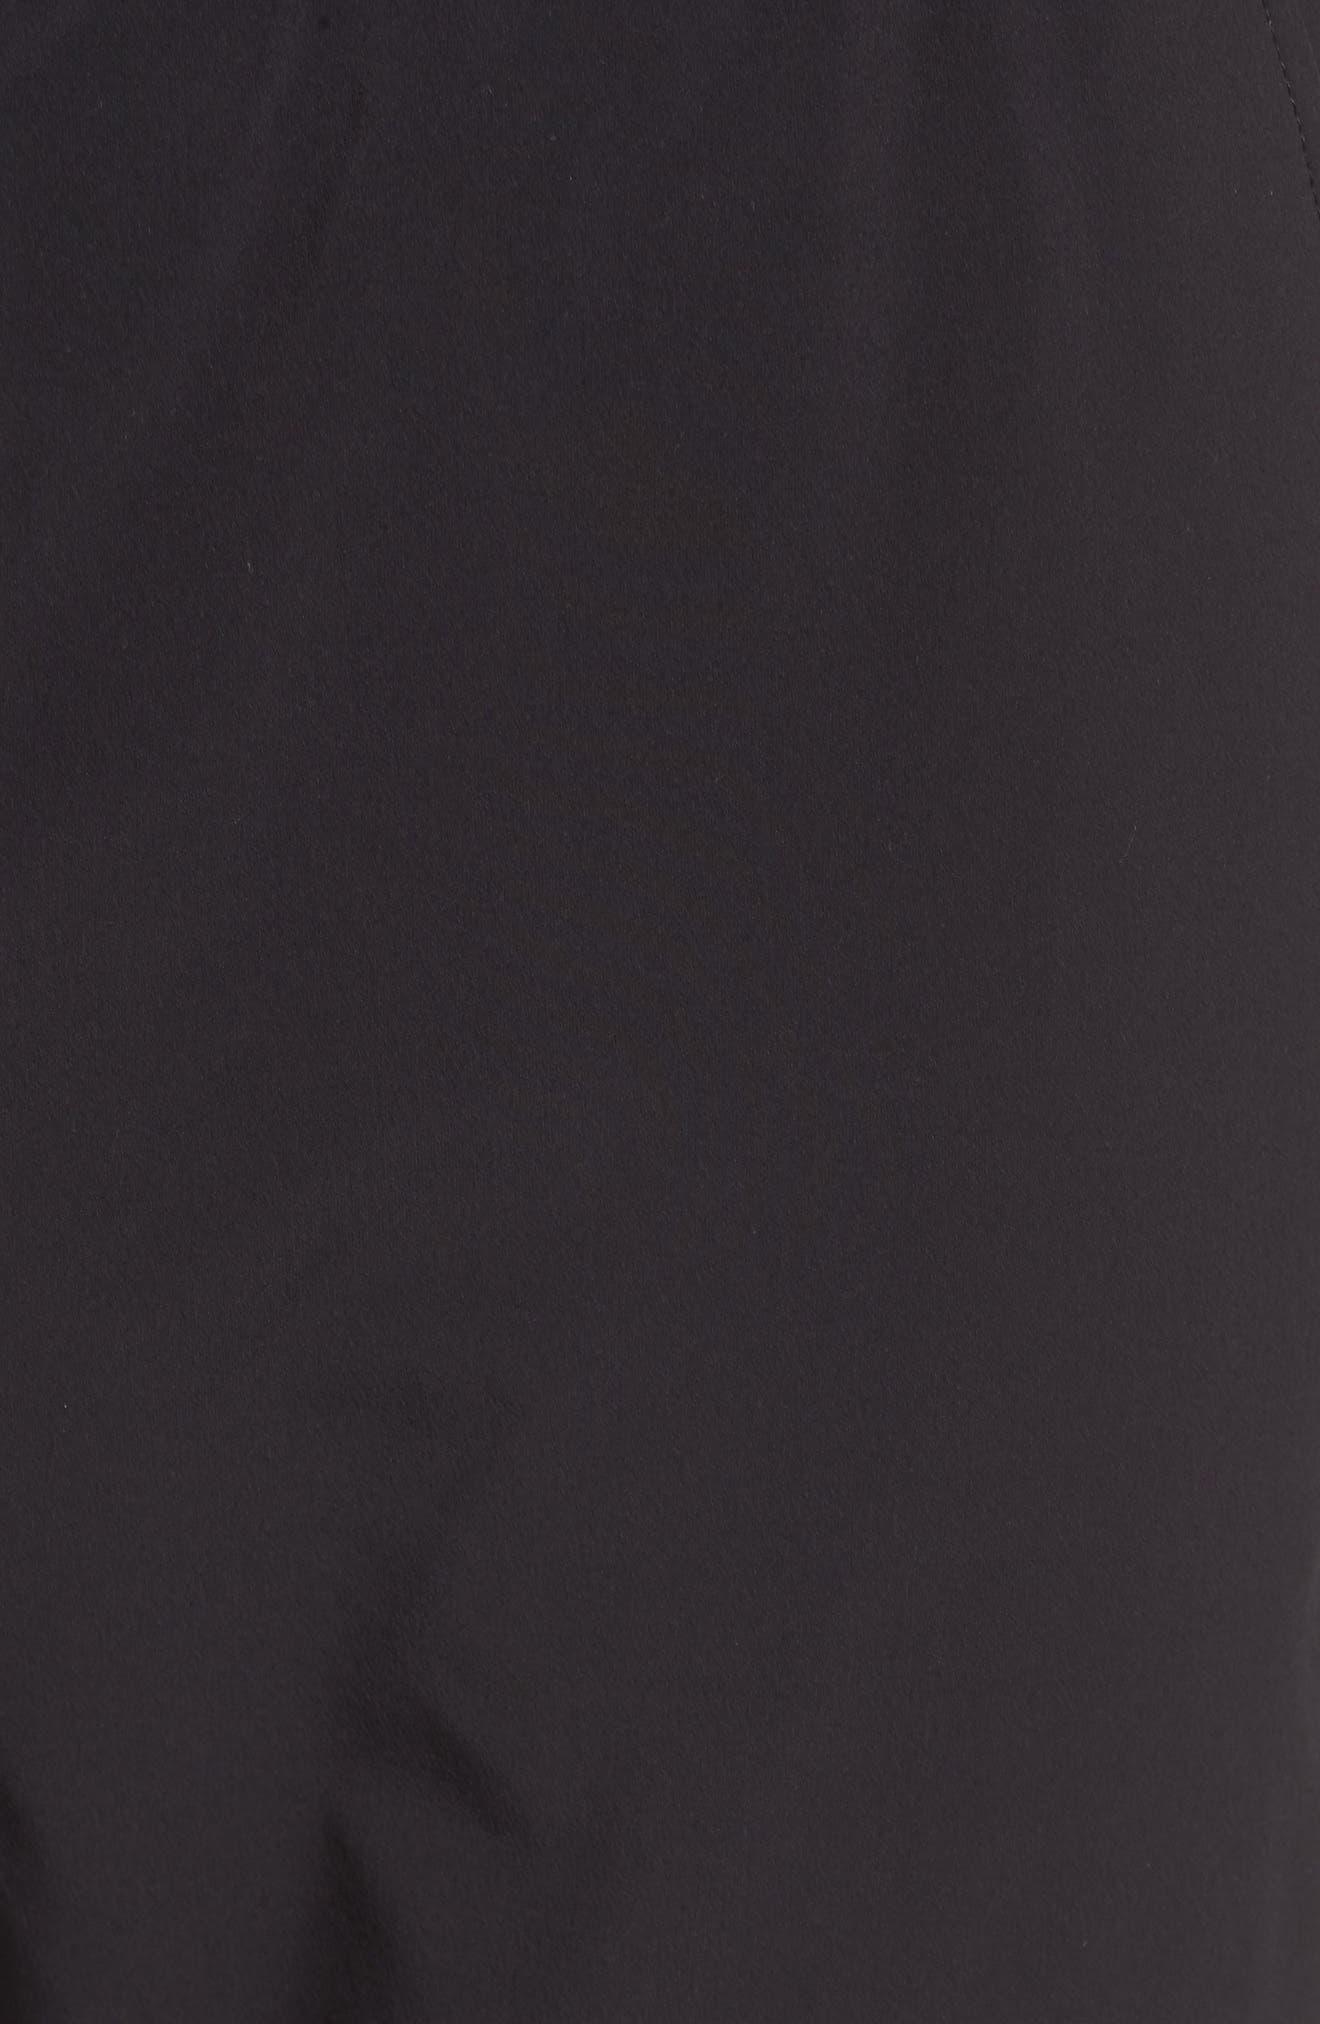 Graphite Tapered Athletic Pants,                             Alternate thumbnail 5, color,                             Black